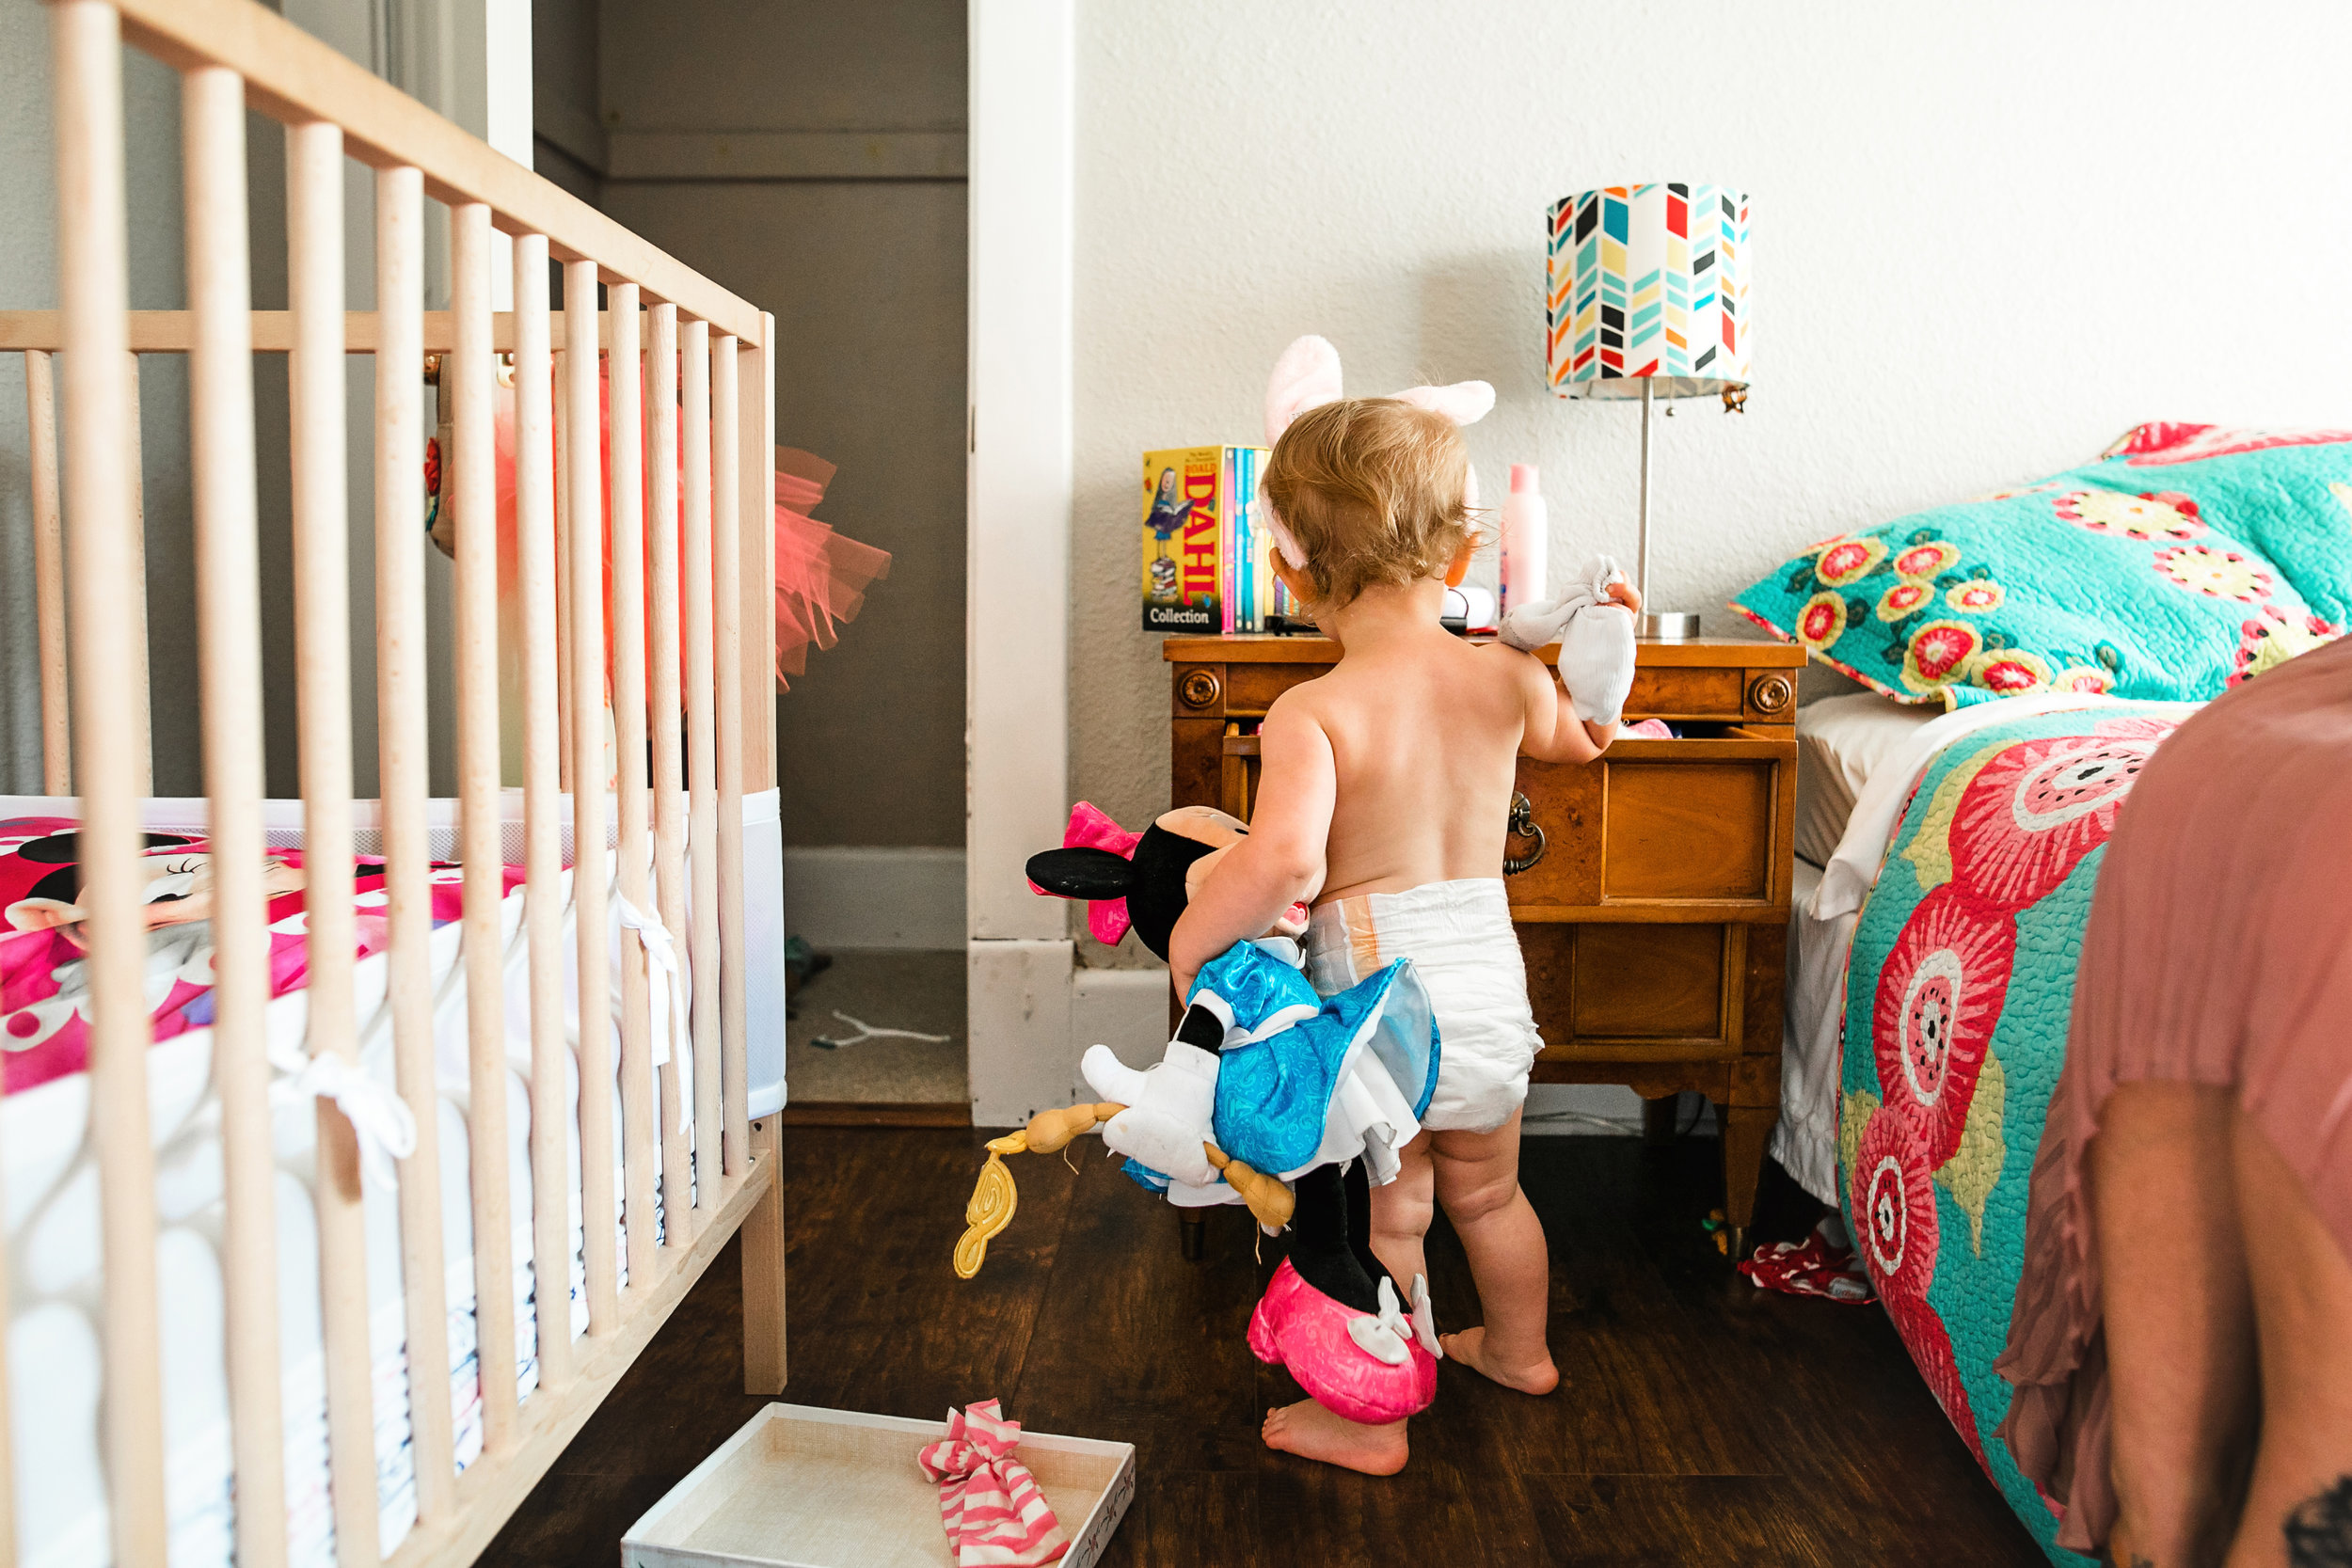 baby digs through nightstand drawer wearing diaper-(ZF-0126-04493-1-007).jpg